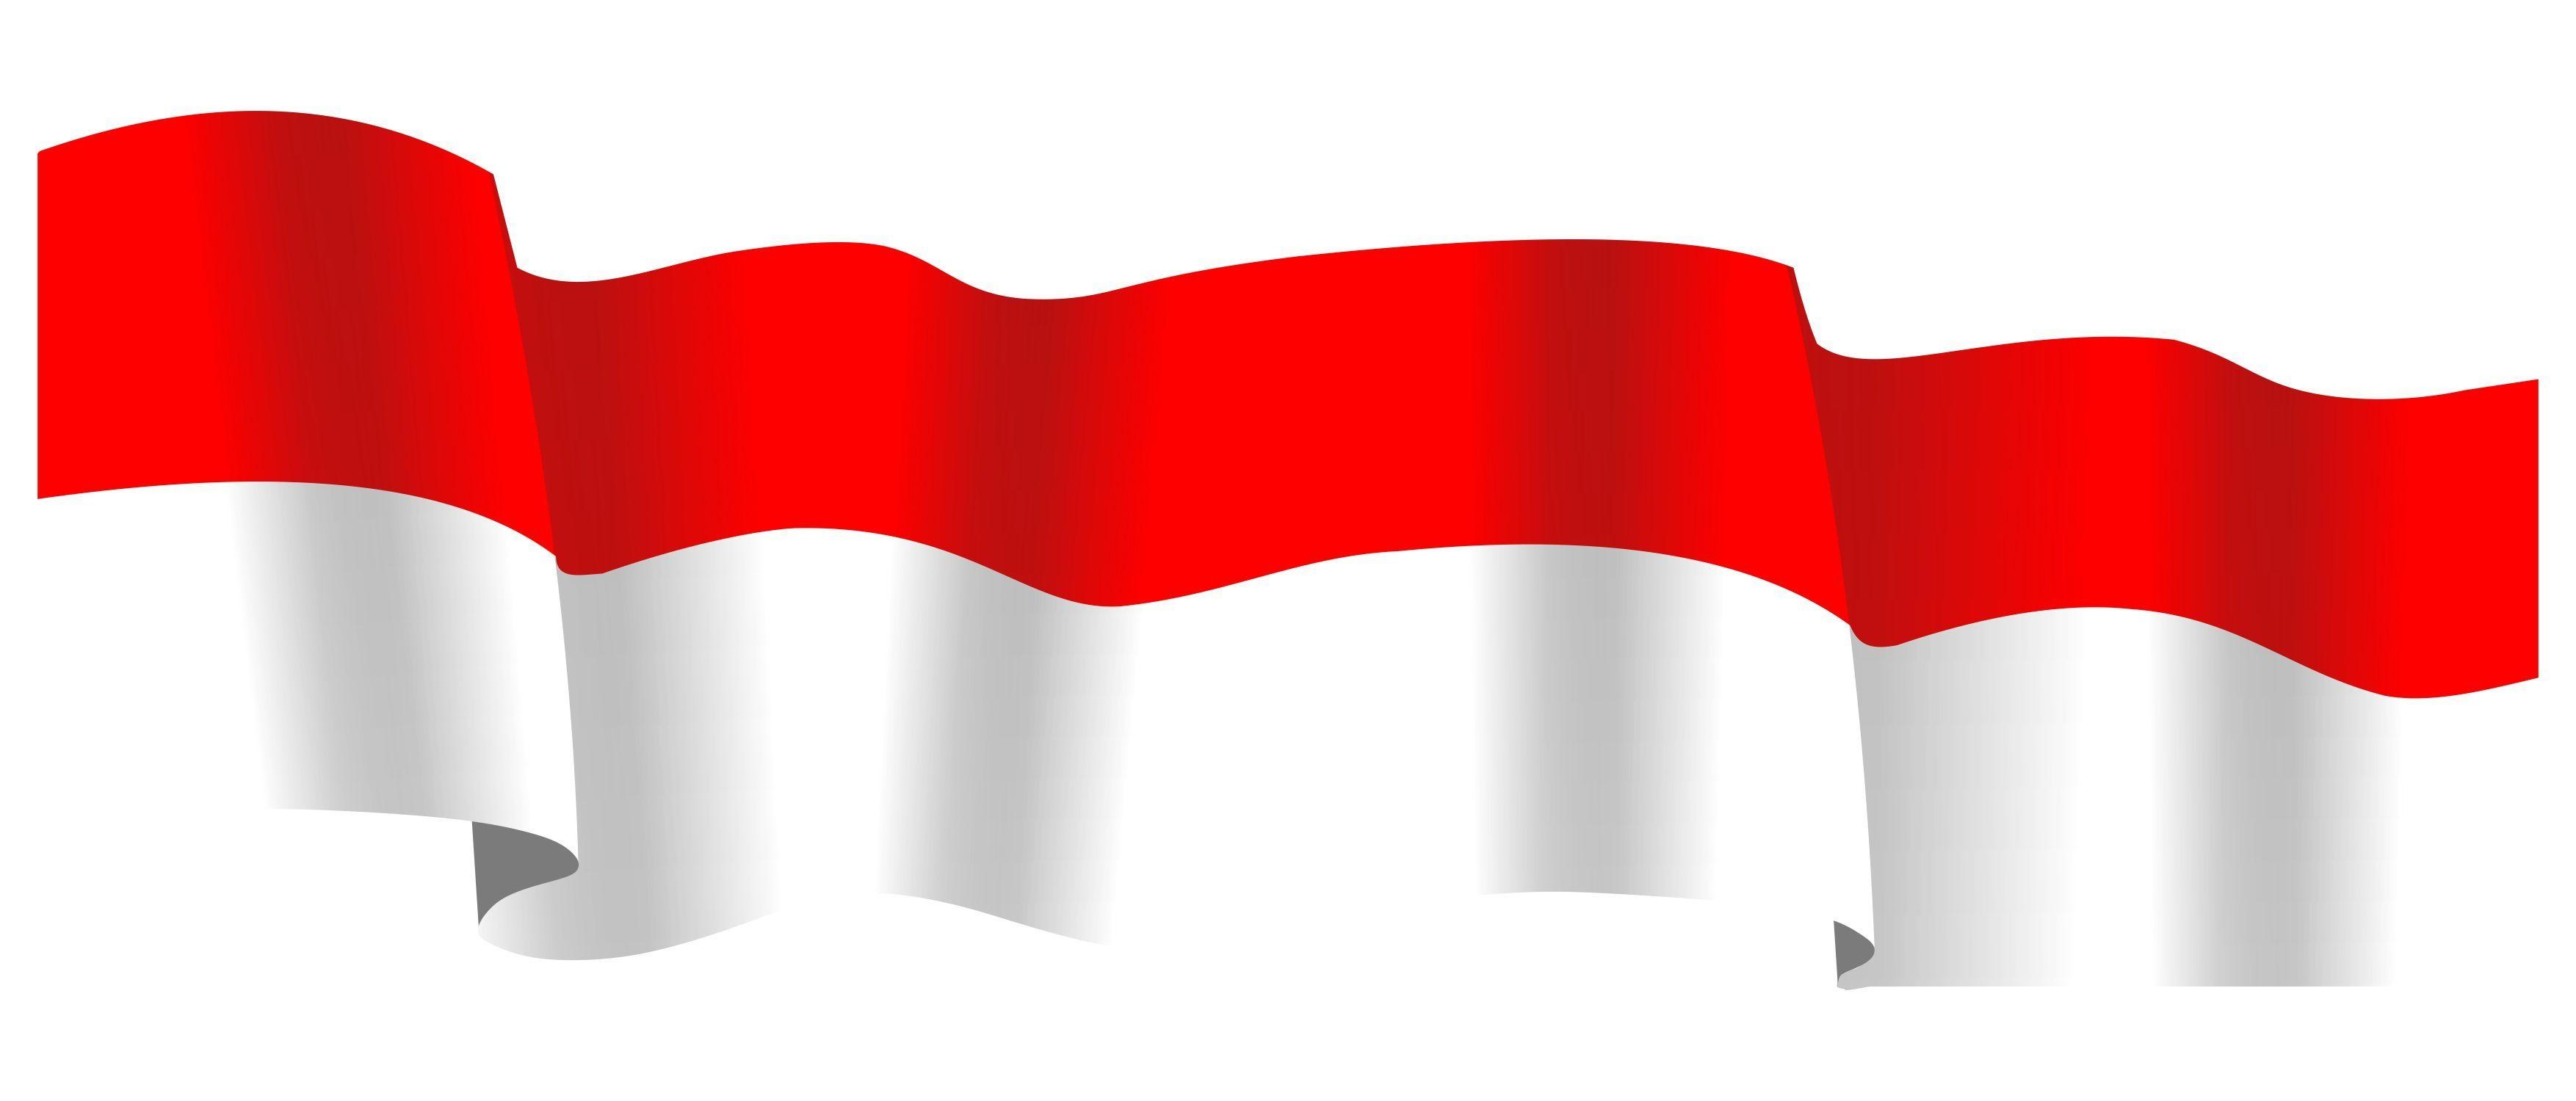 Download vector design background merah.